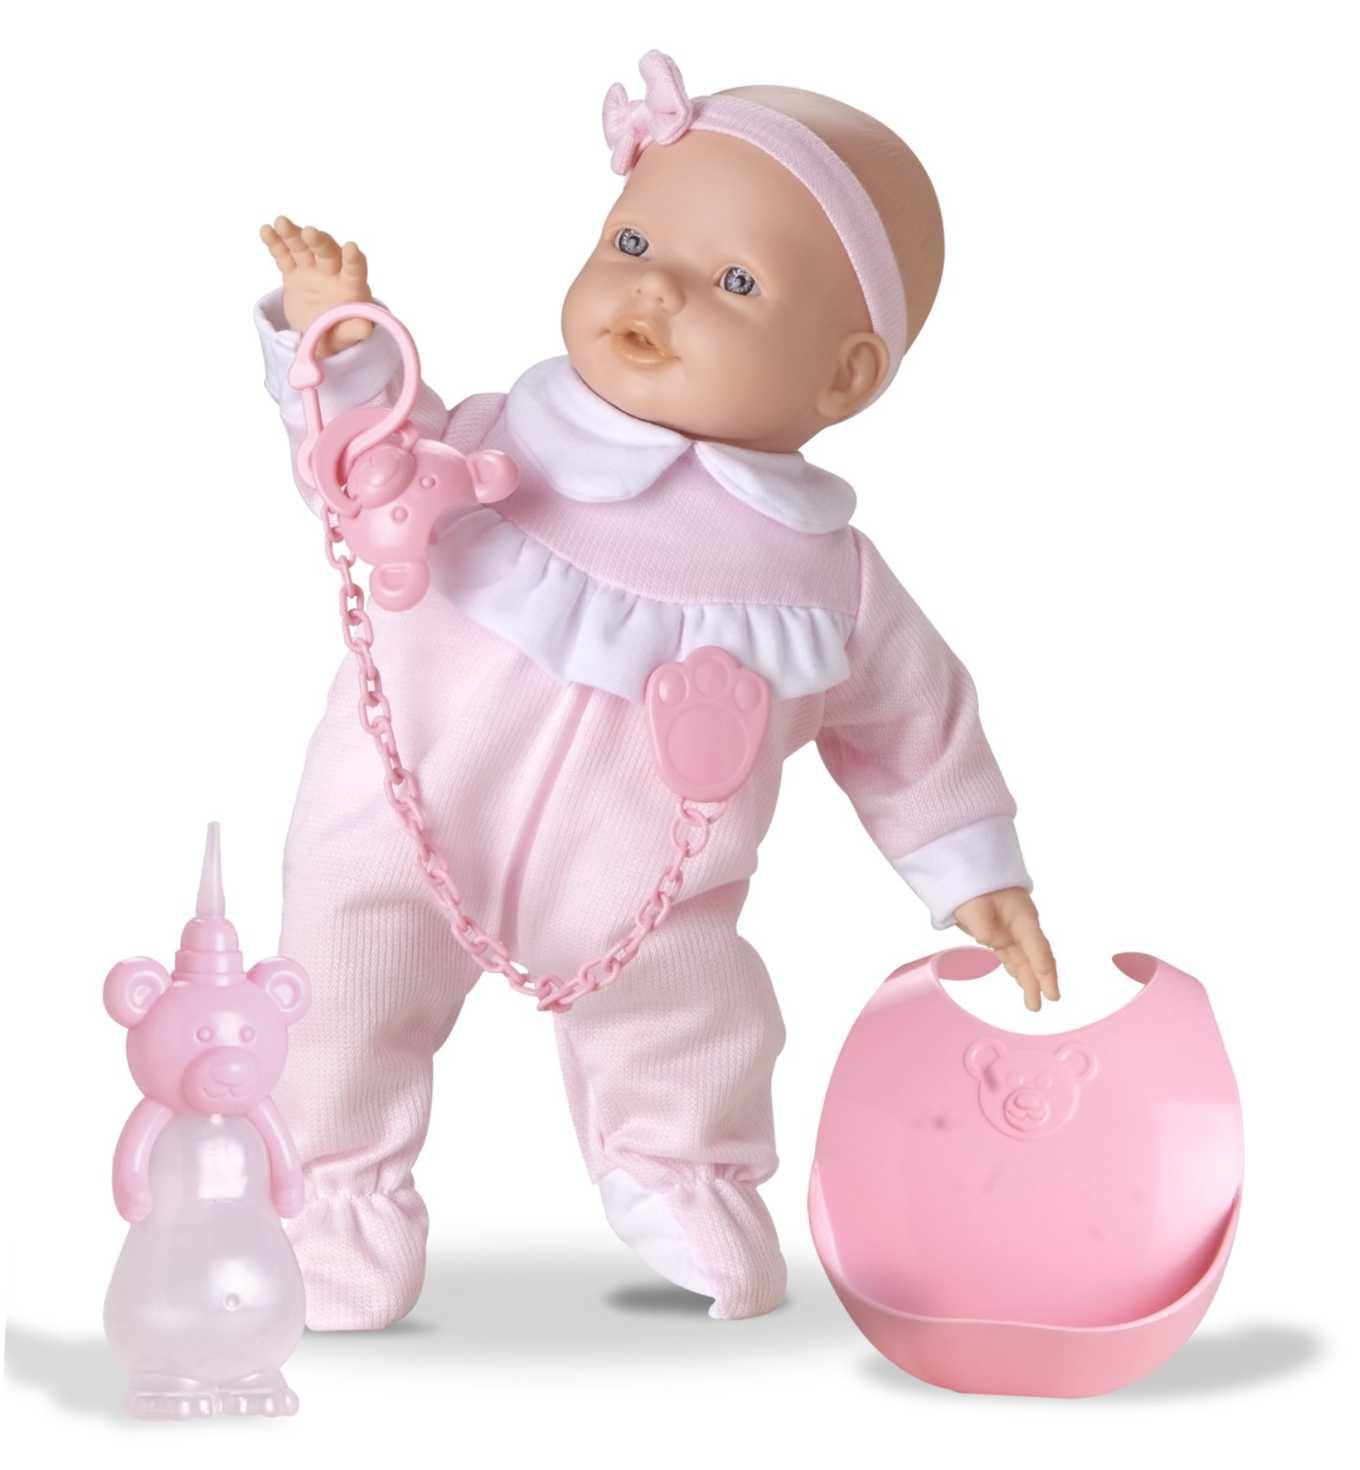 Boneca New Mini Bebê Mania - Baba - Roma Brinquedos